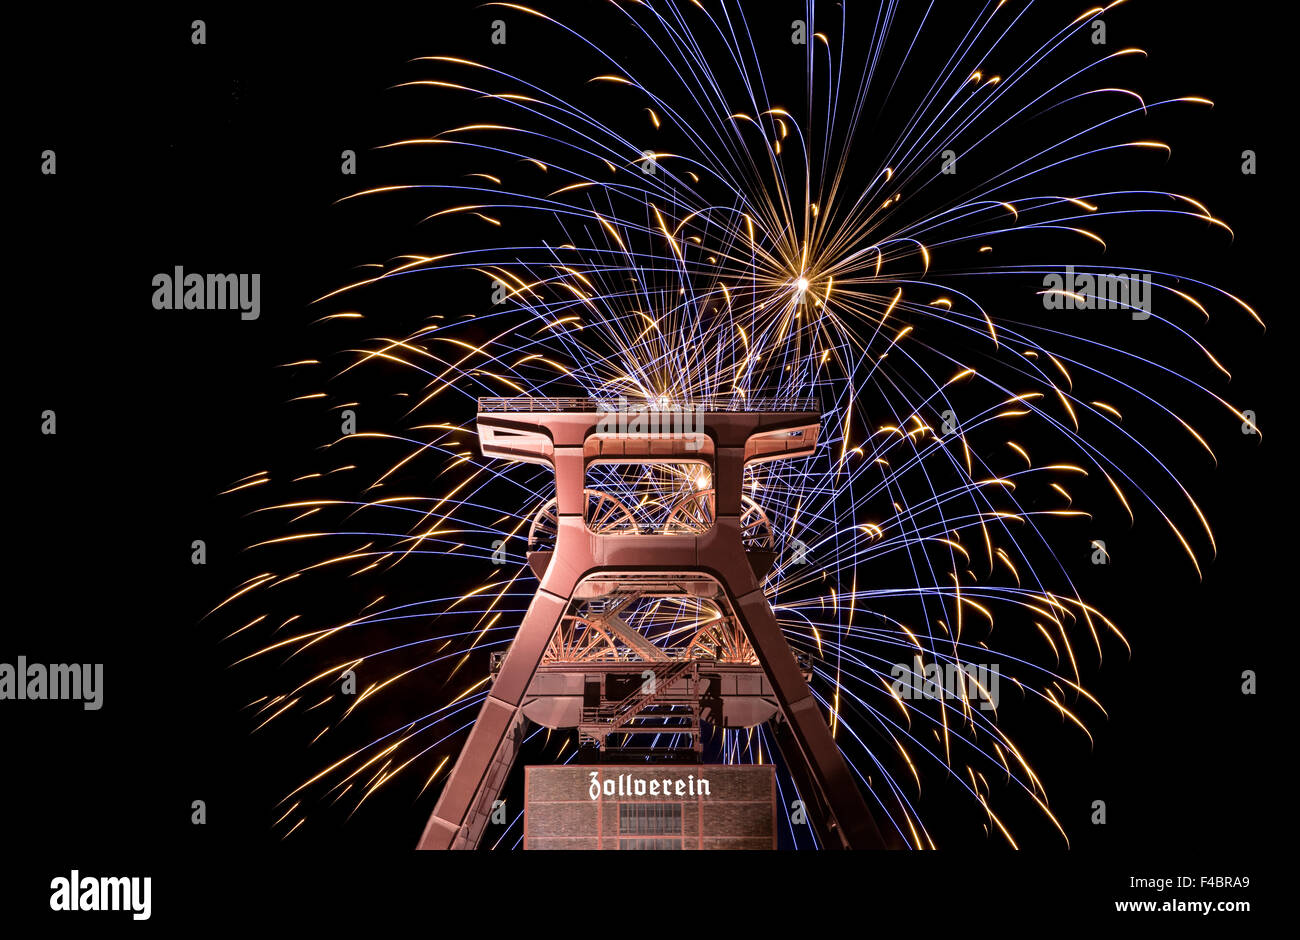 Fireworks, Zollverein, Essen, Germany - Stock Image